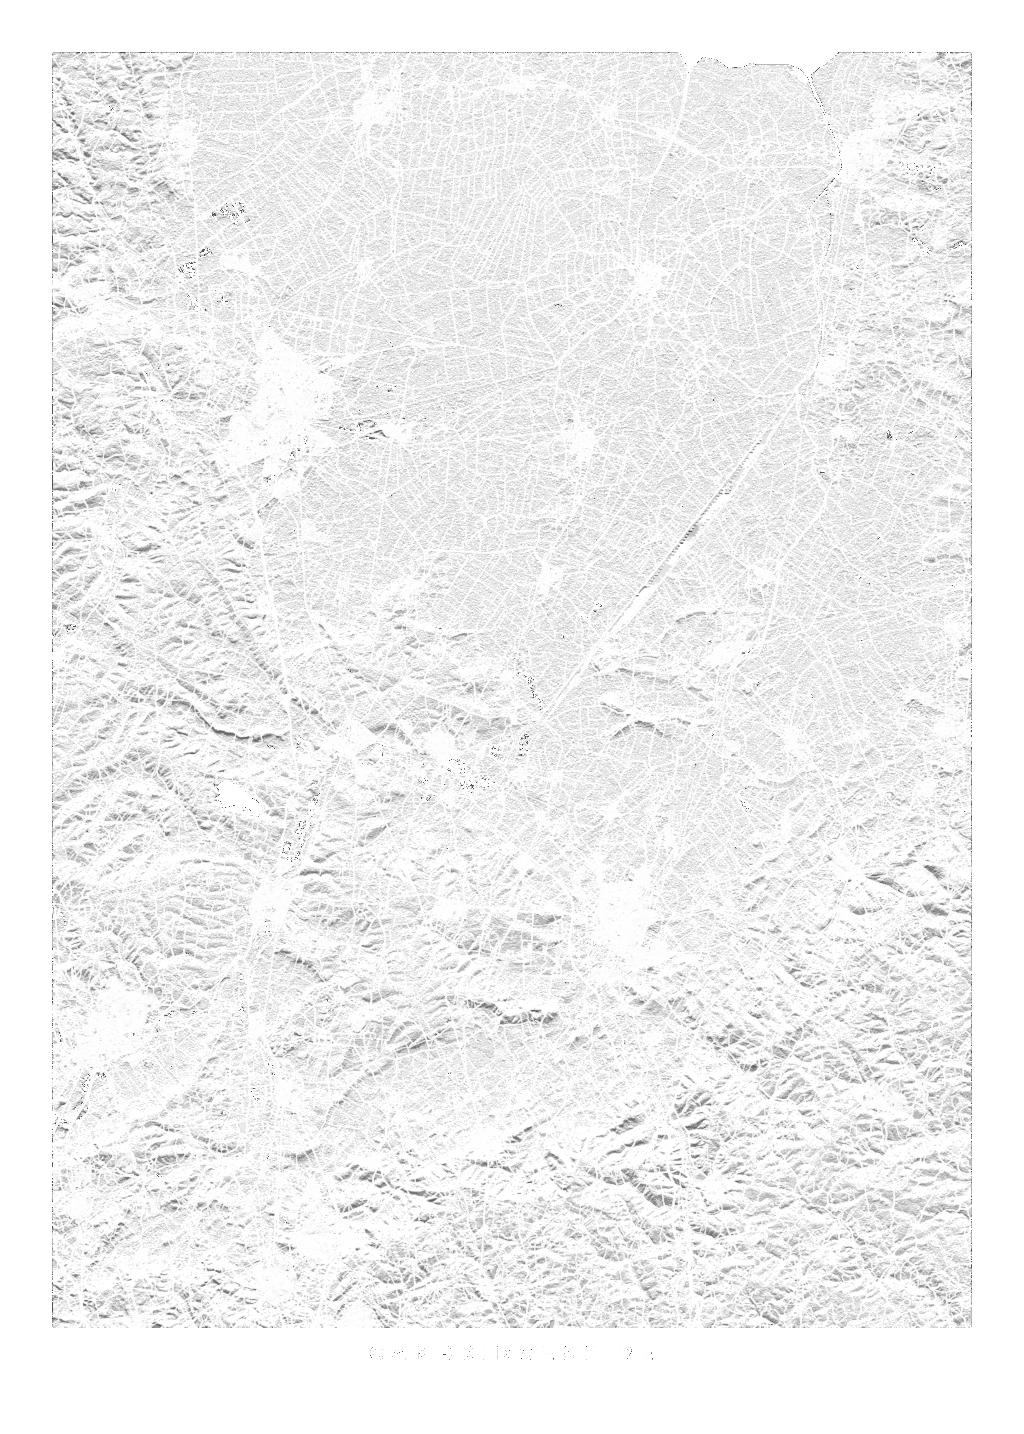 Cambridgeshire wall map